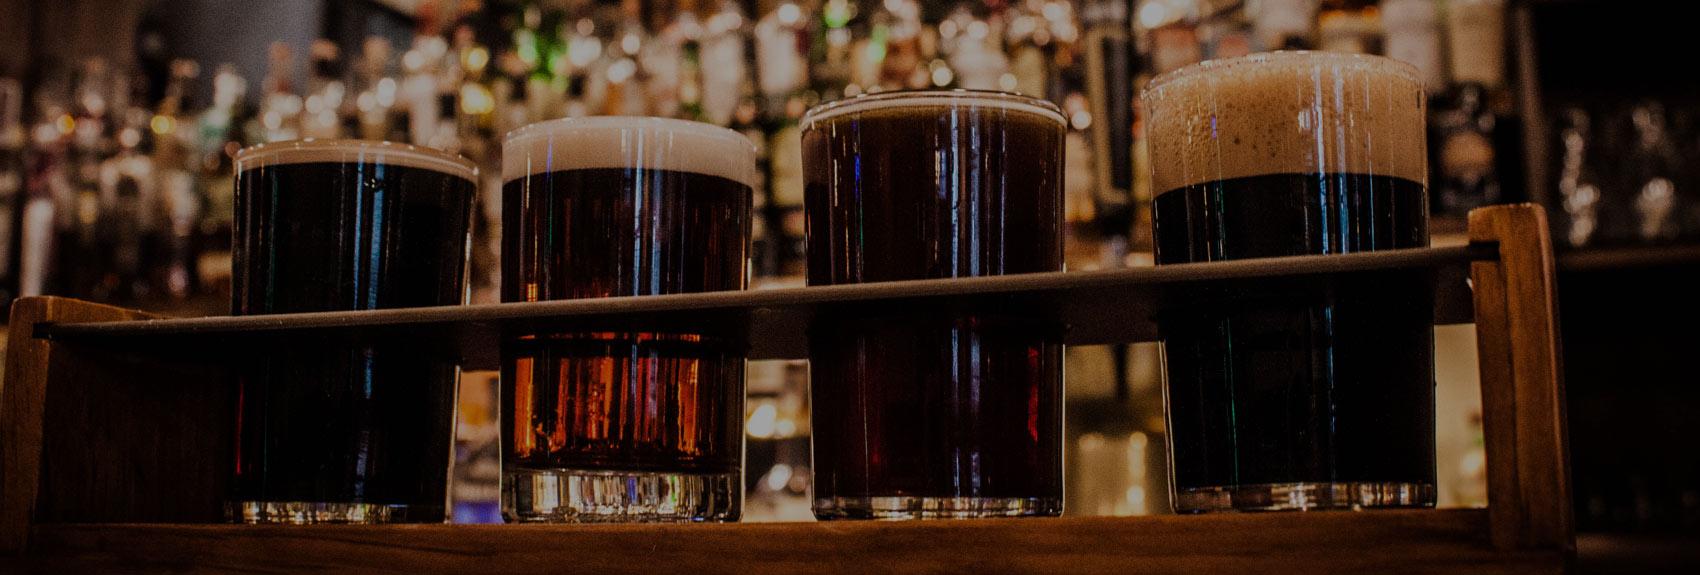 Beer Selection - Kilpatrick's Pub, Ithaca NY